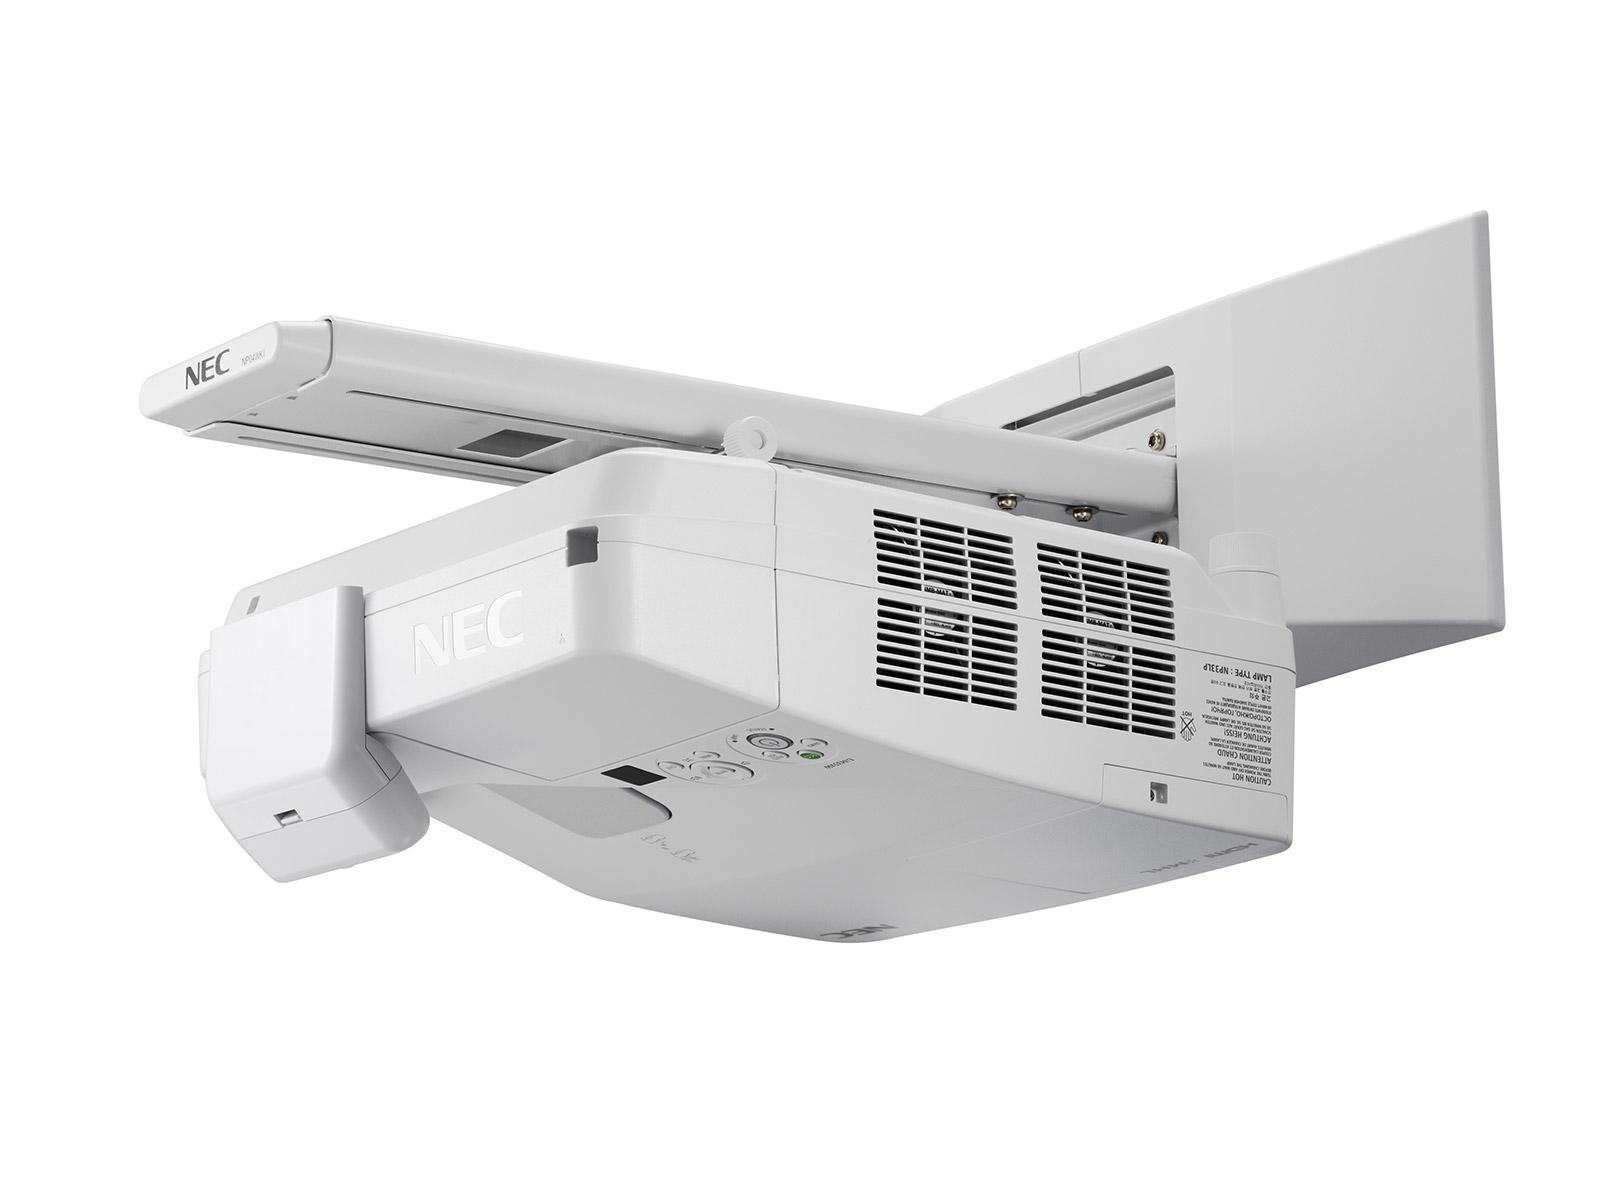 Projector Interactive Multipen Um301xi 3000lm Xga Incl. Wall-mount + Interactive Multipen Module